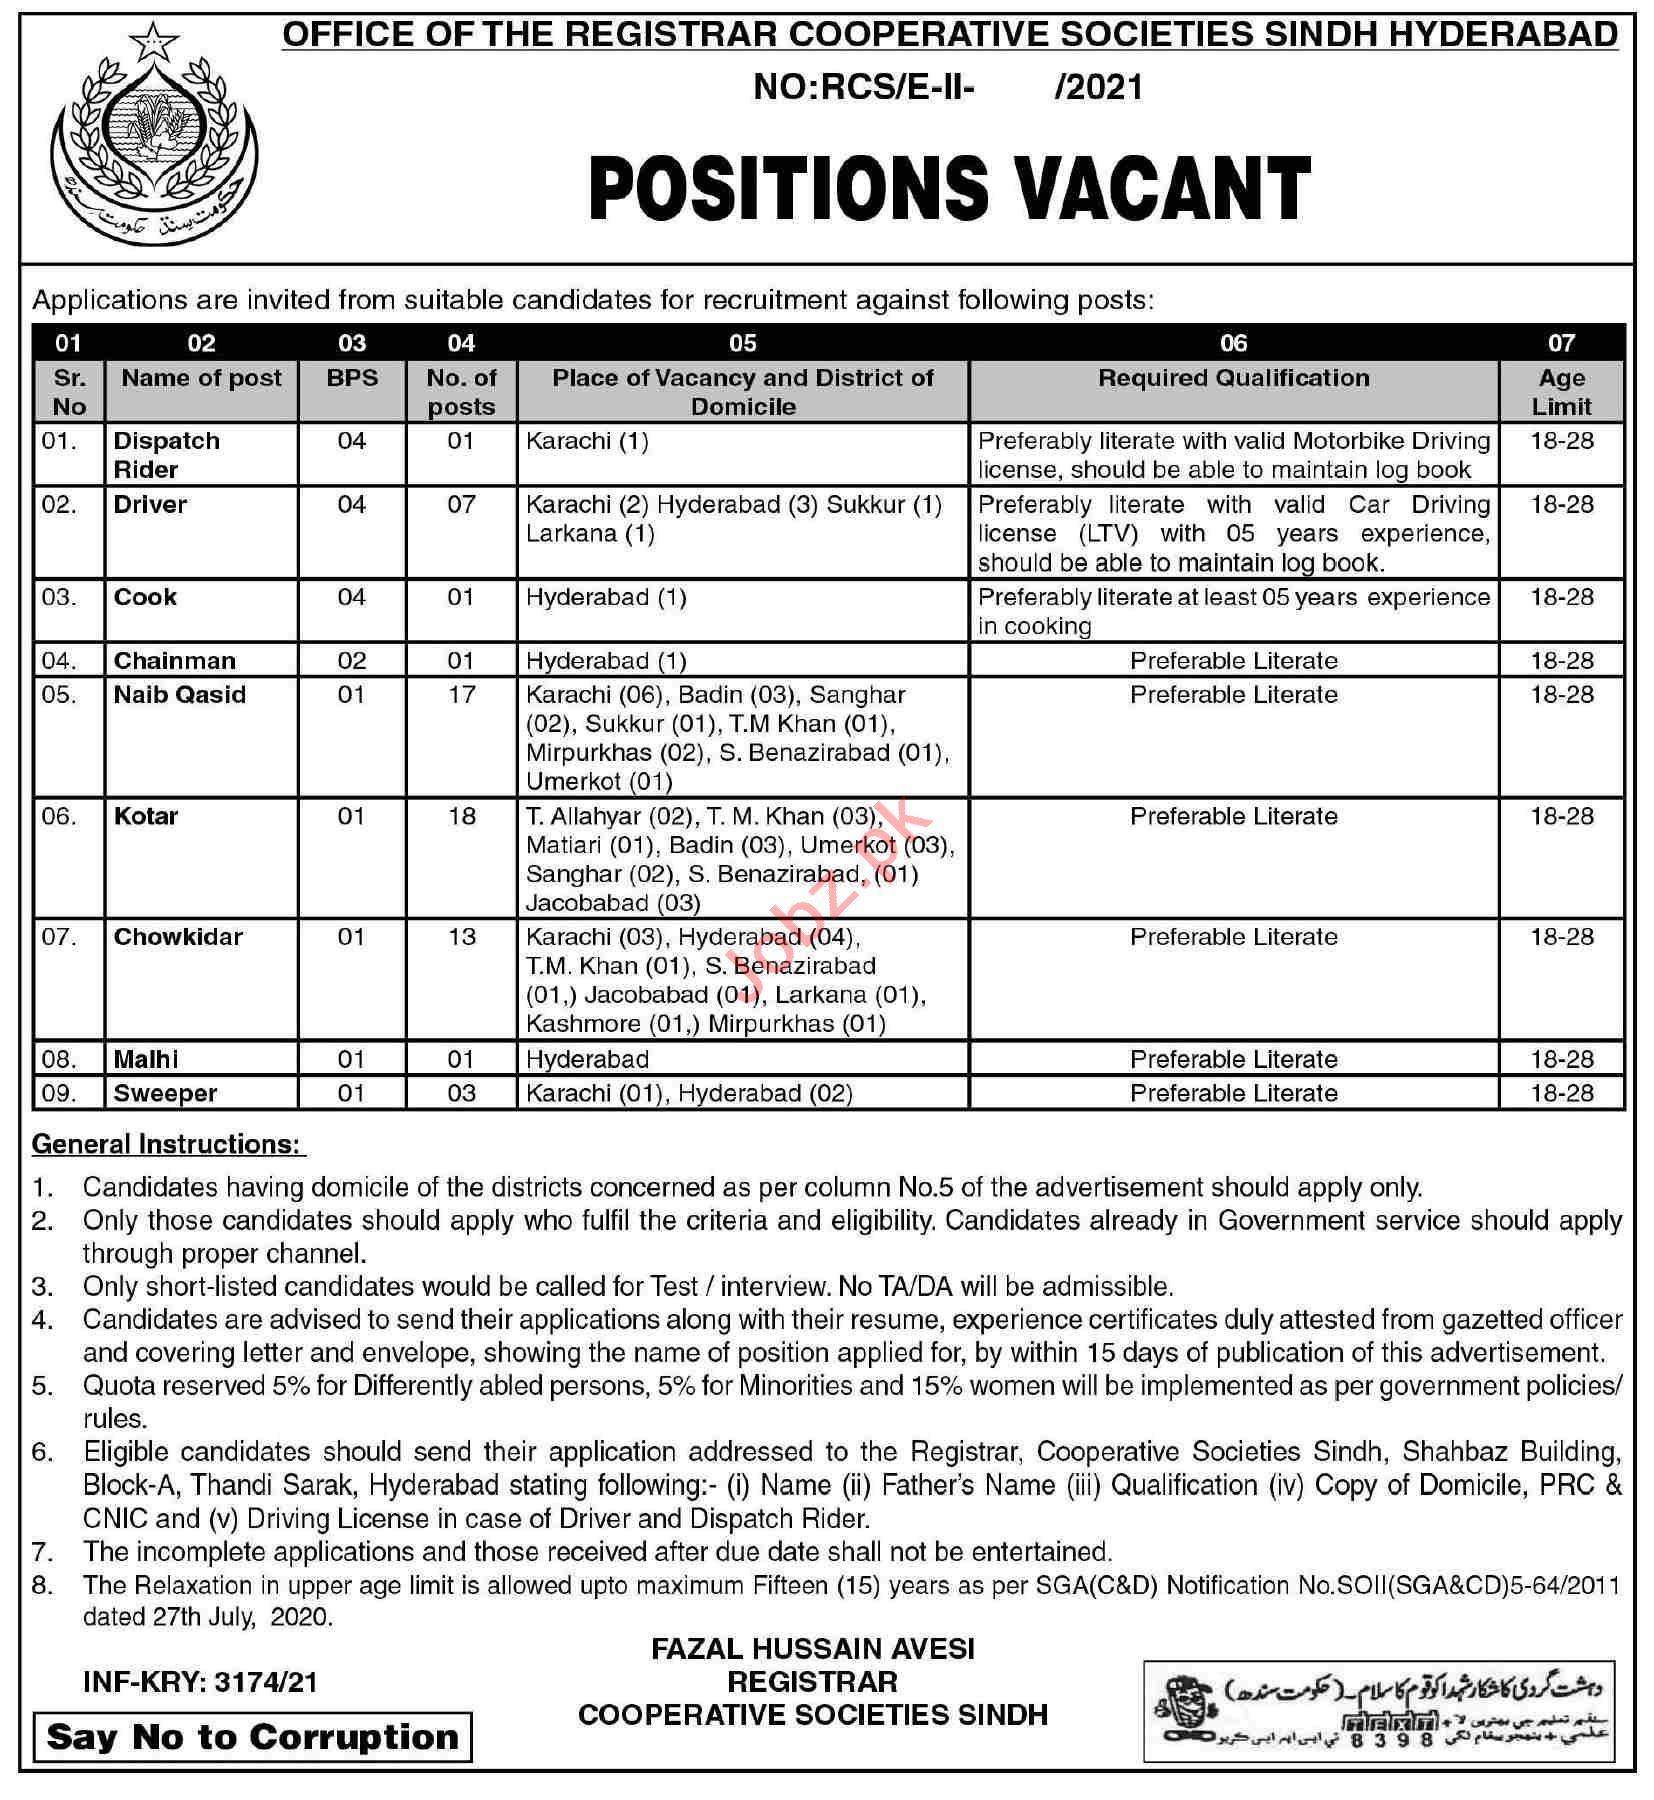 Registrar Cooperative Societies Sindh Hyderabad Jobs 2021